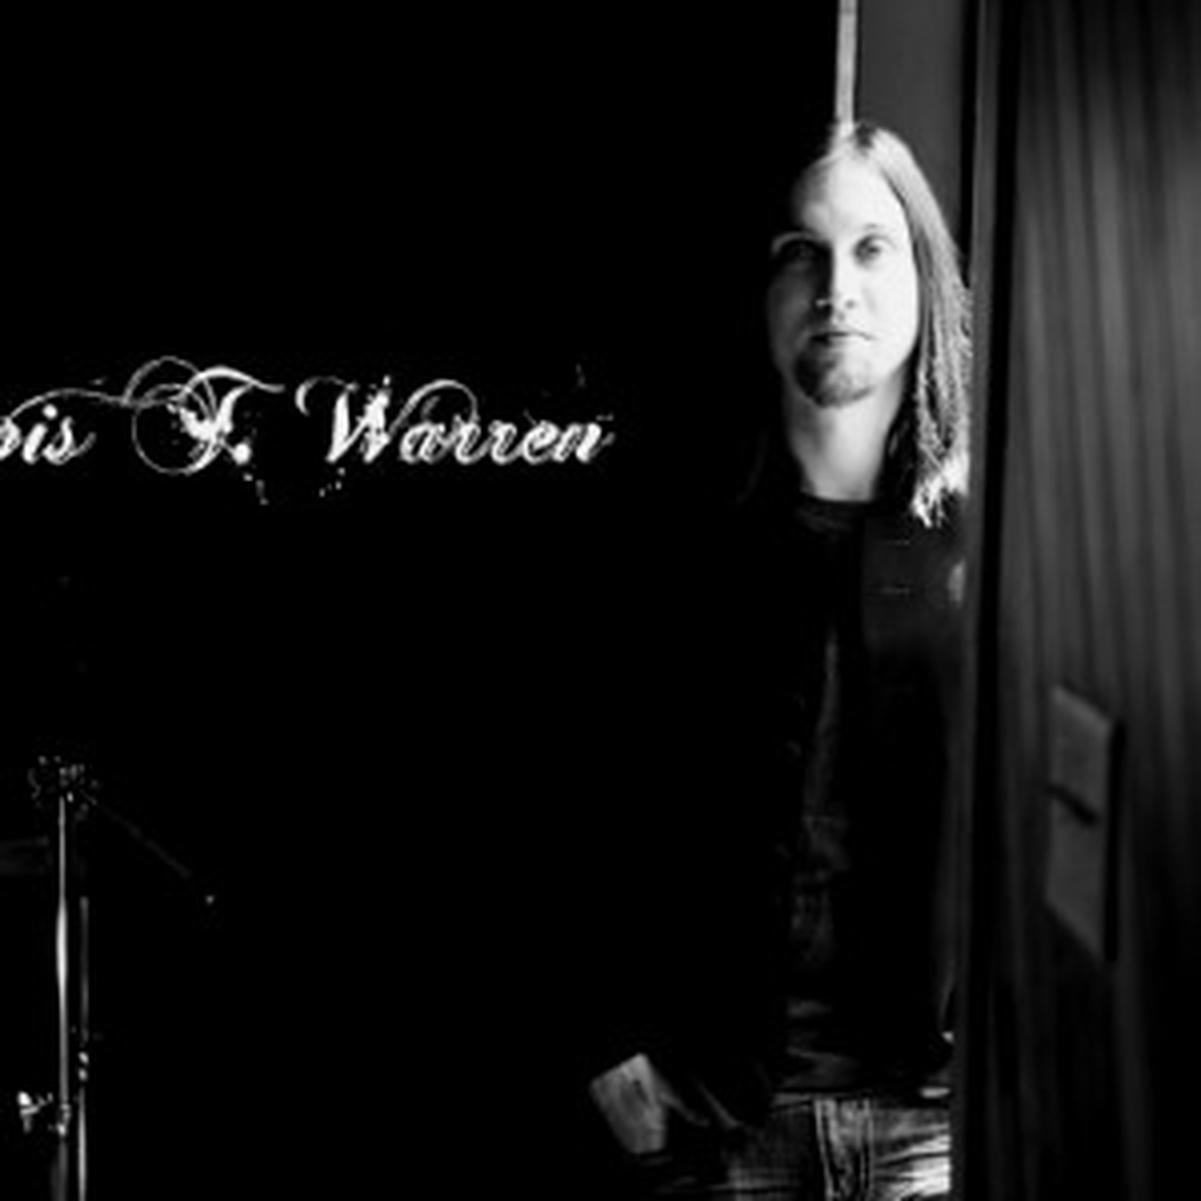 Travis Warren